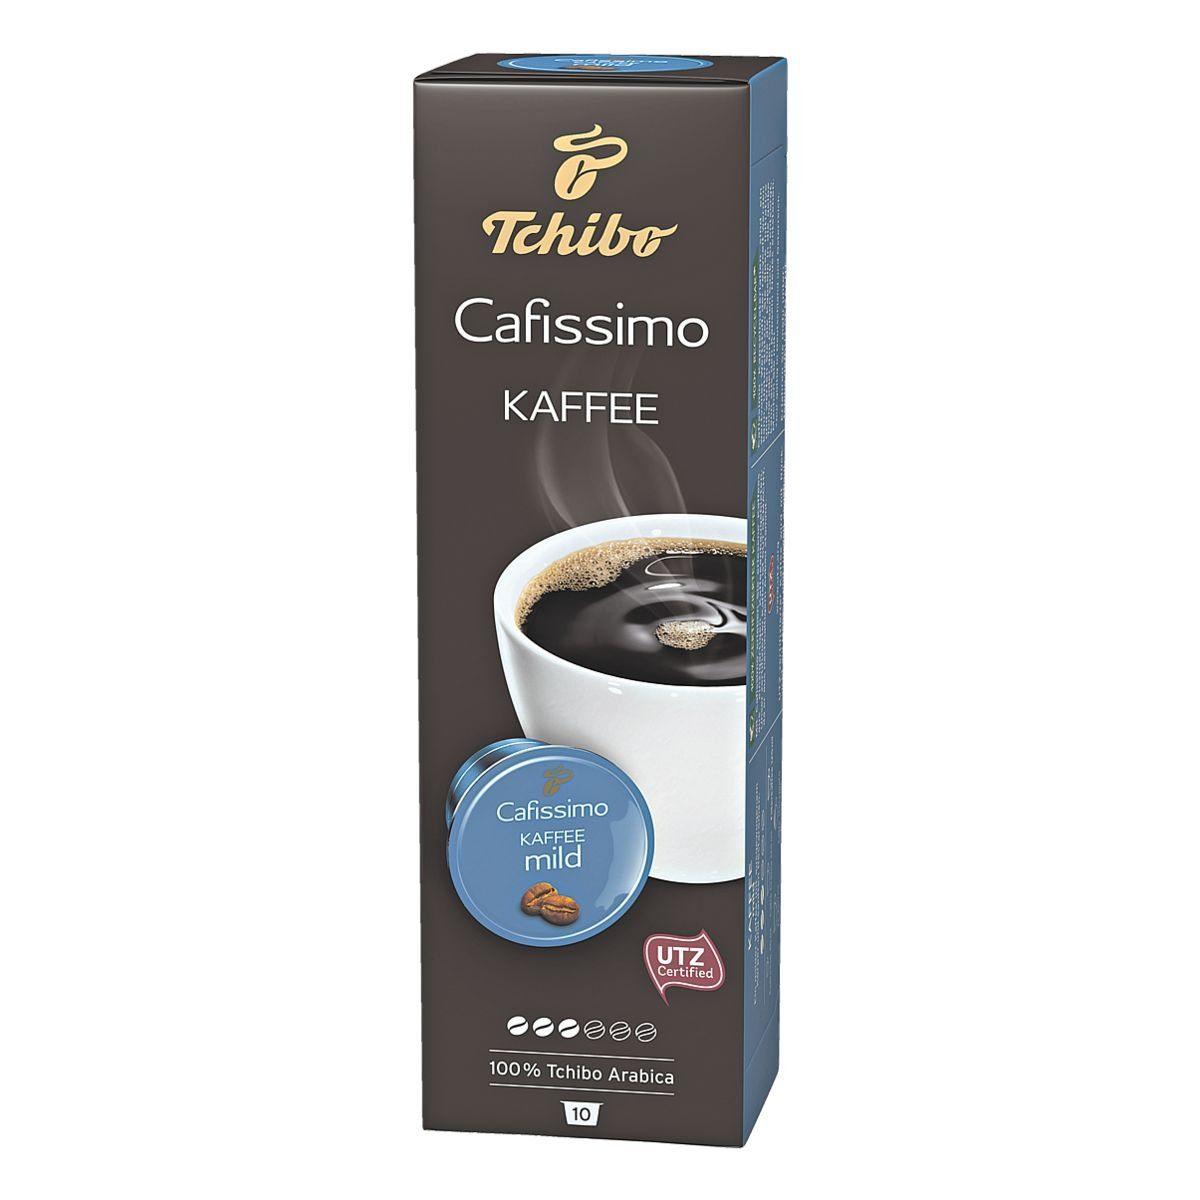 Tchibo Kaffeekapseln »Kaffee mild«